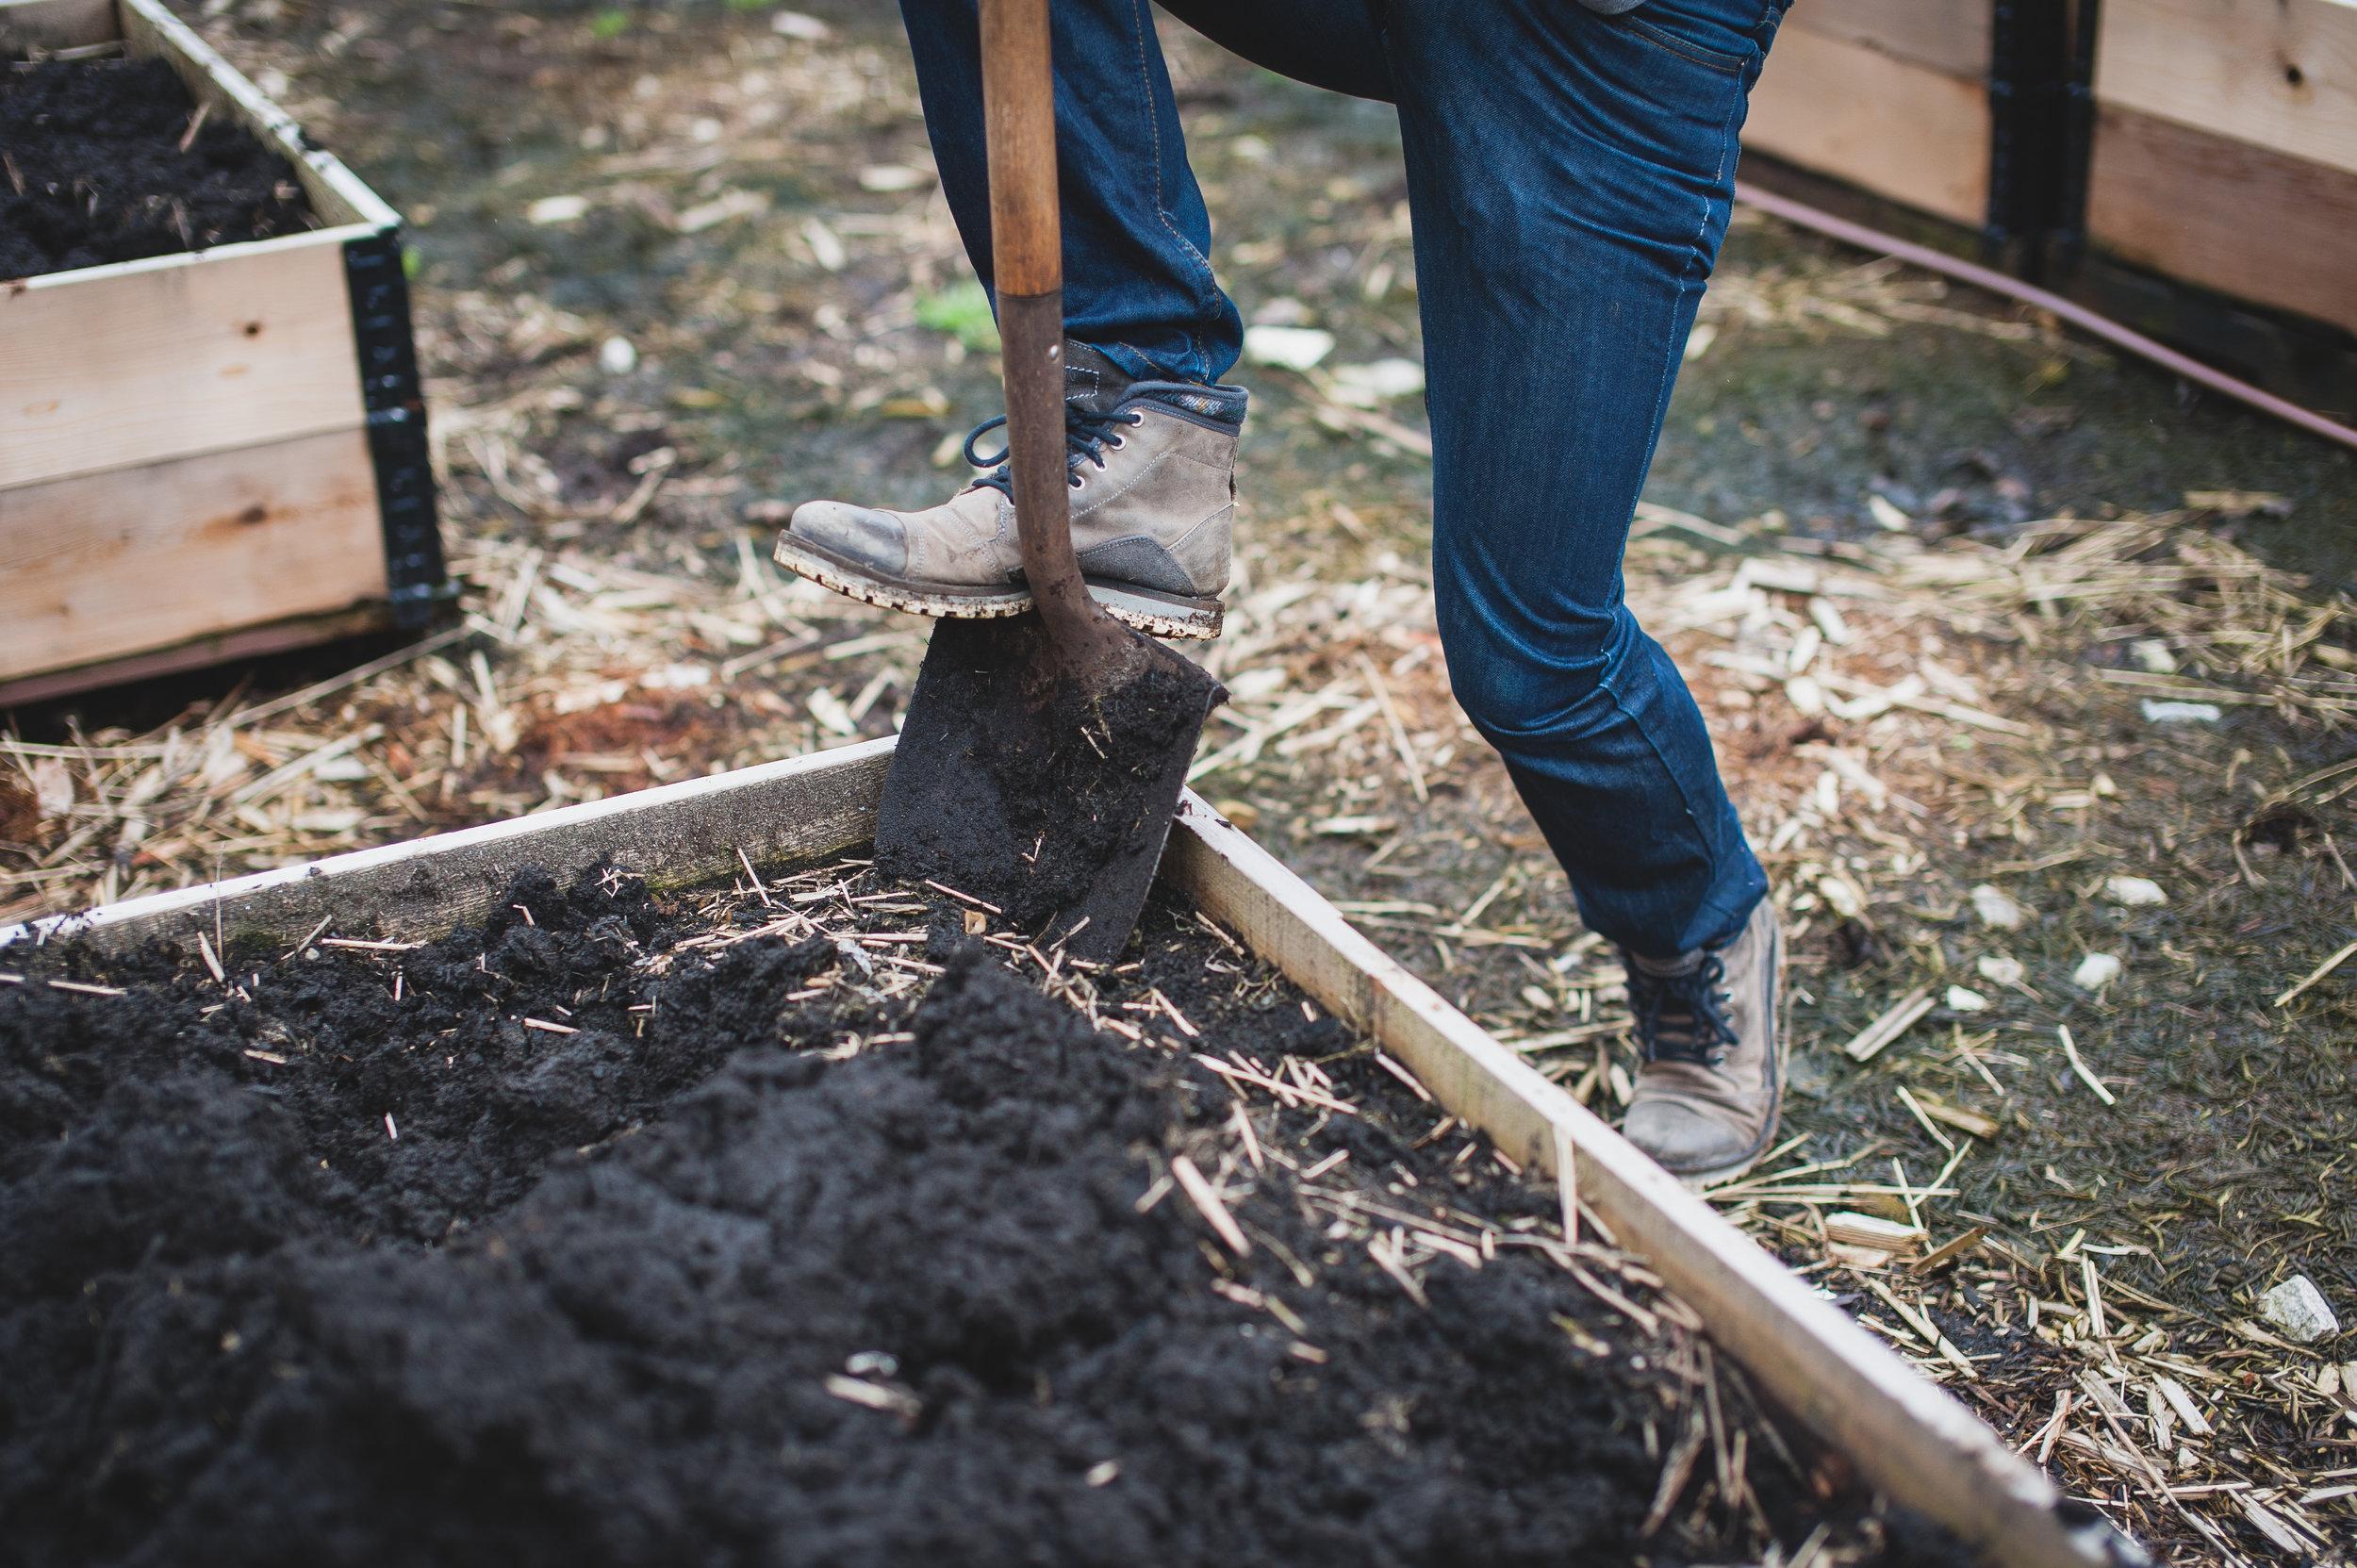 Shifting_Growth_Raised_Garden Beds_Community_Garden_Vancouver - South_False_Creek_Garden - 8.jpg